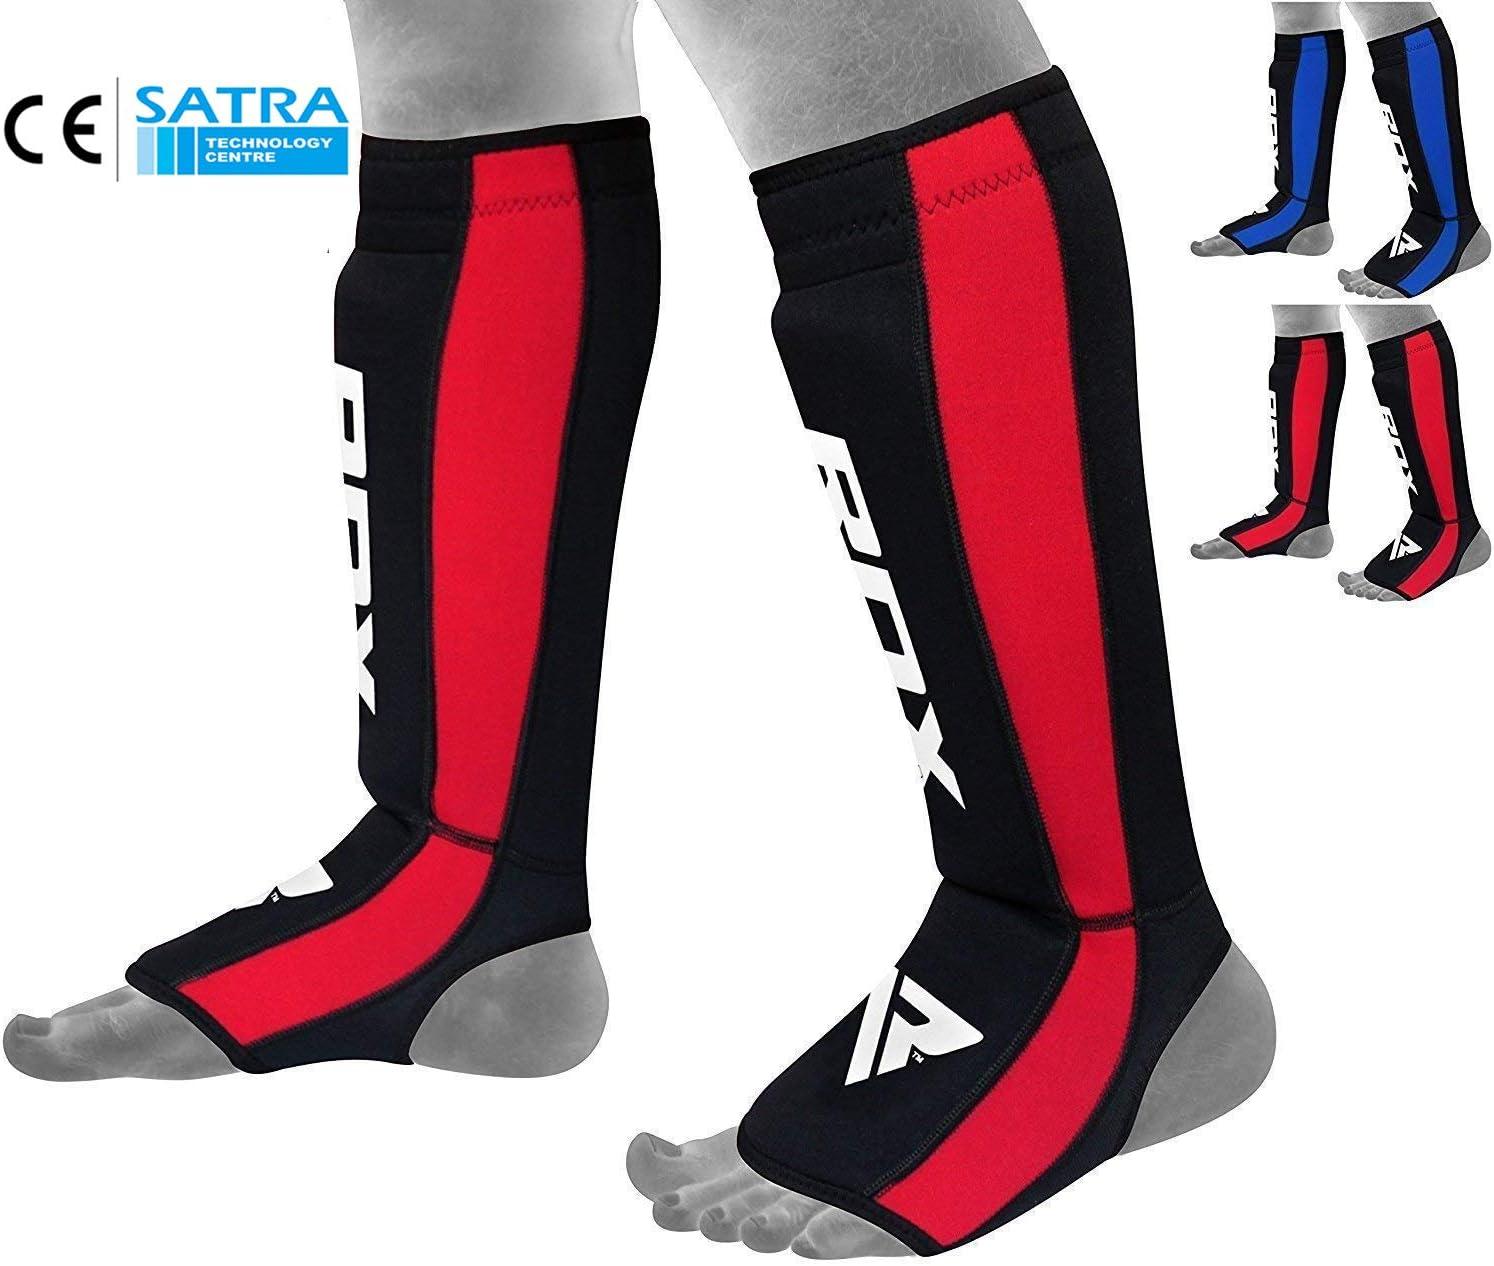 Boxe Prot/ège Tibia Combat Pied MMA Cheville Kick Boxing Karate Certifi/é CE Approuv/é par SATRA RDX N/éopr/ène